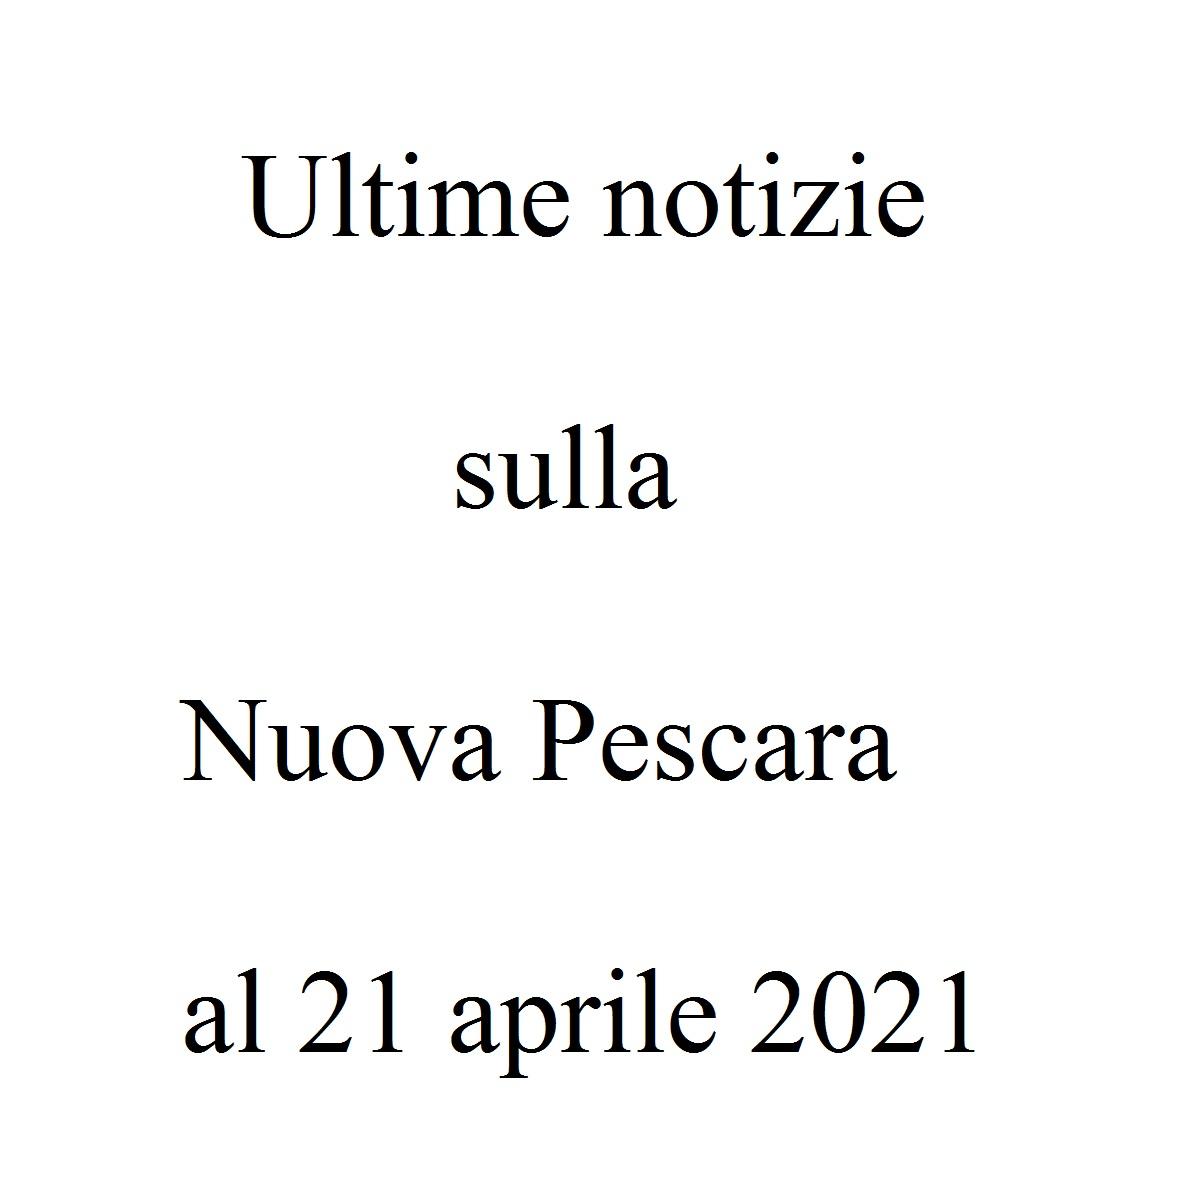 Ultime notizie sulla Nuova Pescara al 21 aprile 2021 foto